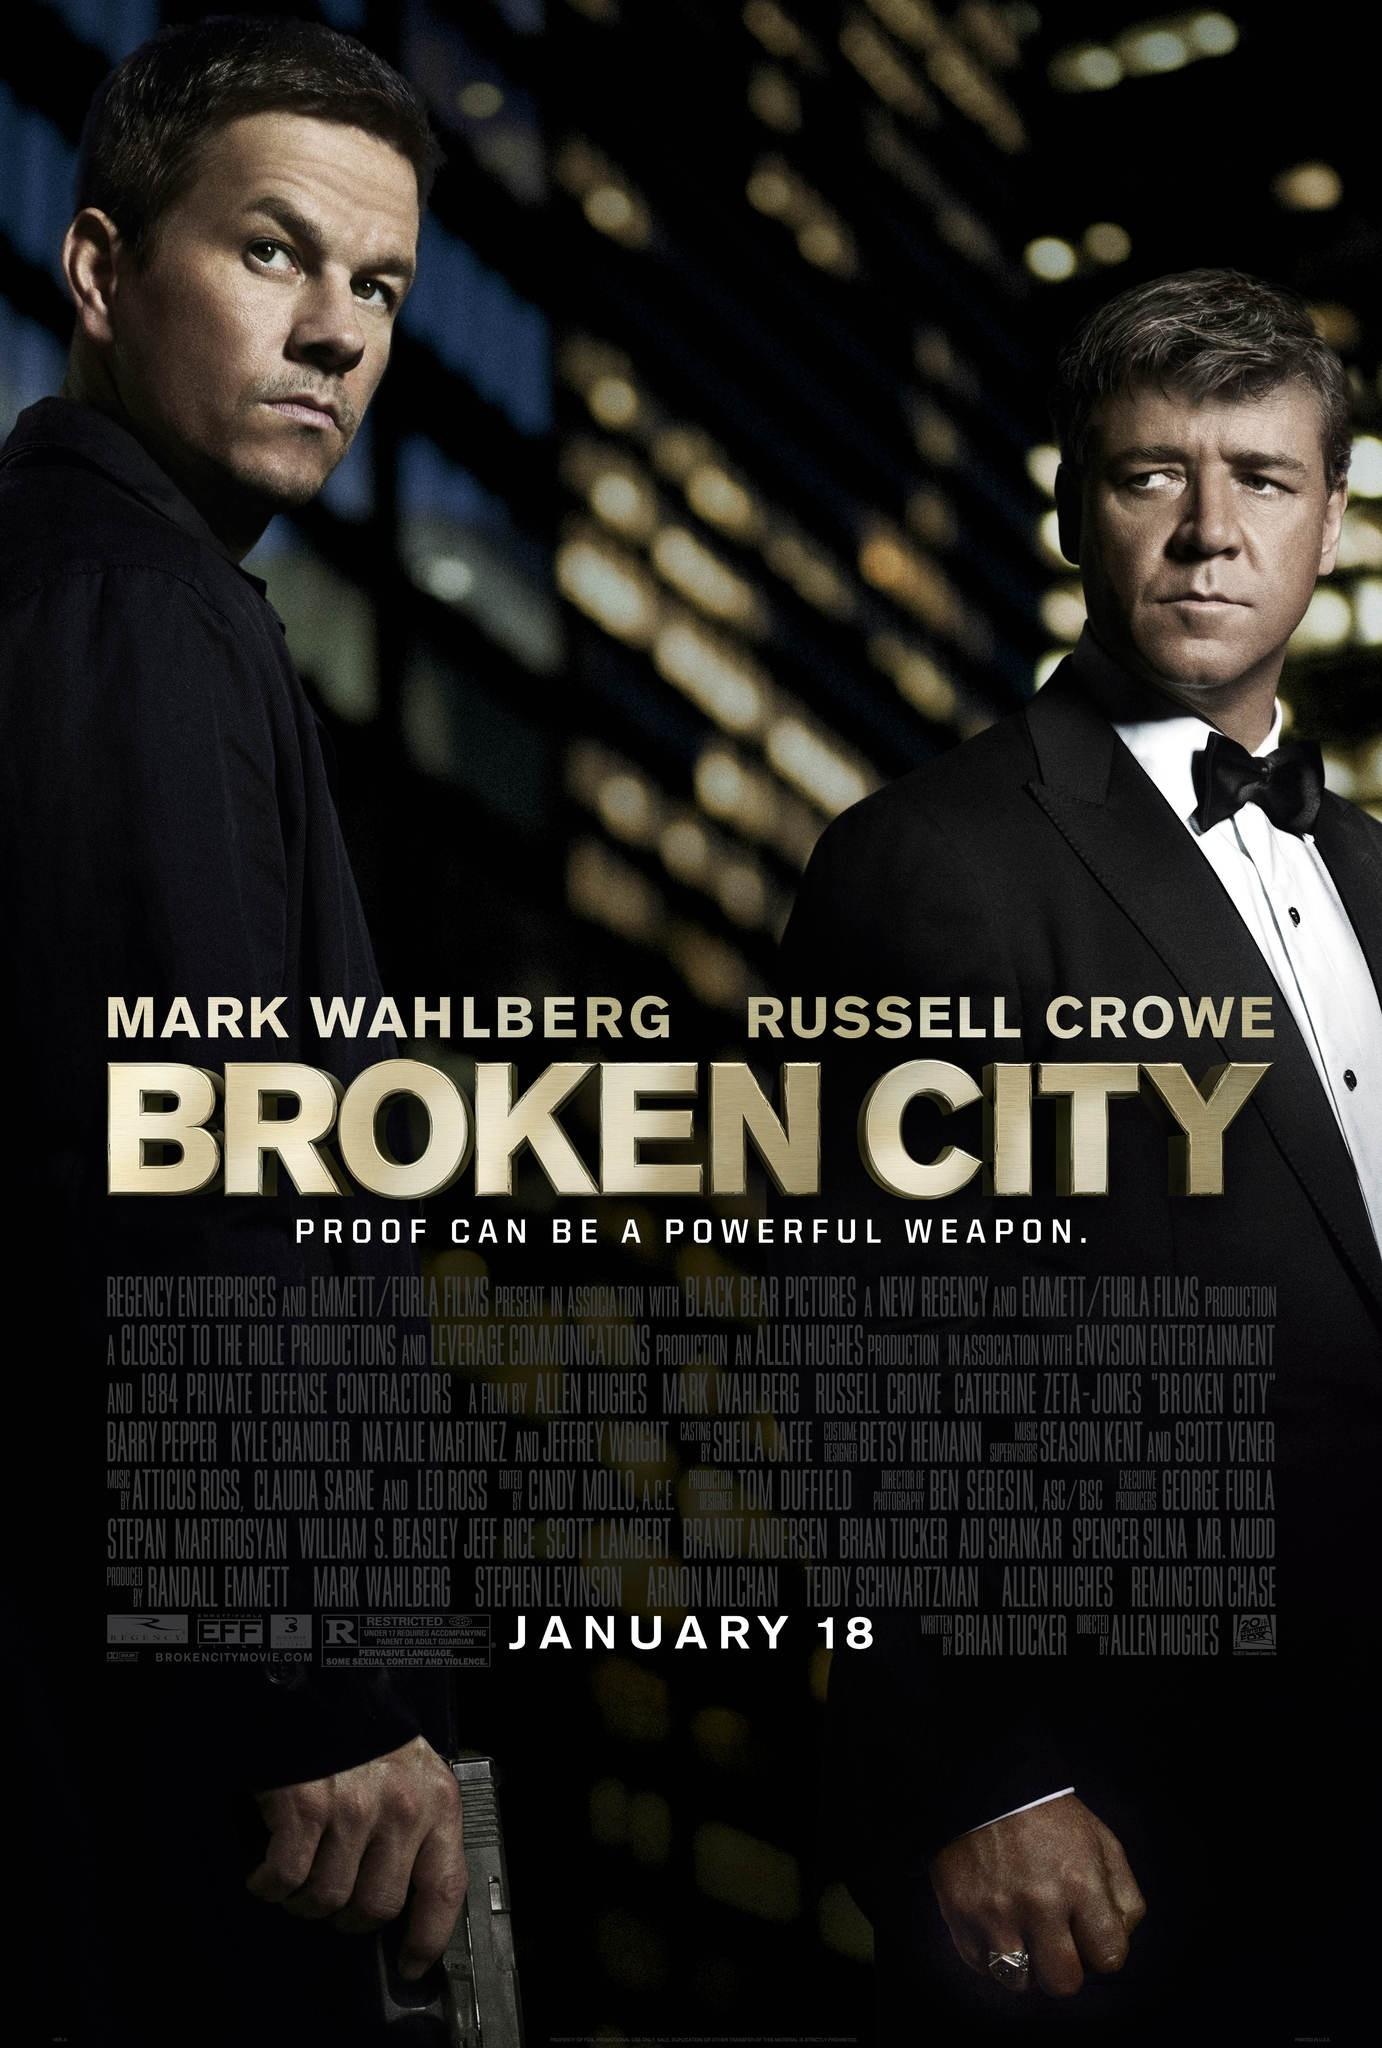 Broken City - Movie Poster #1 (Original)